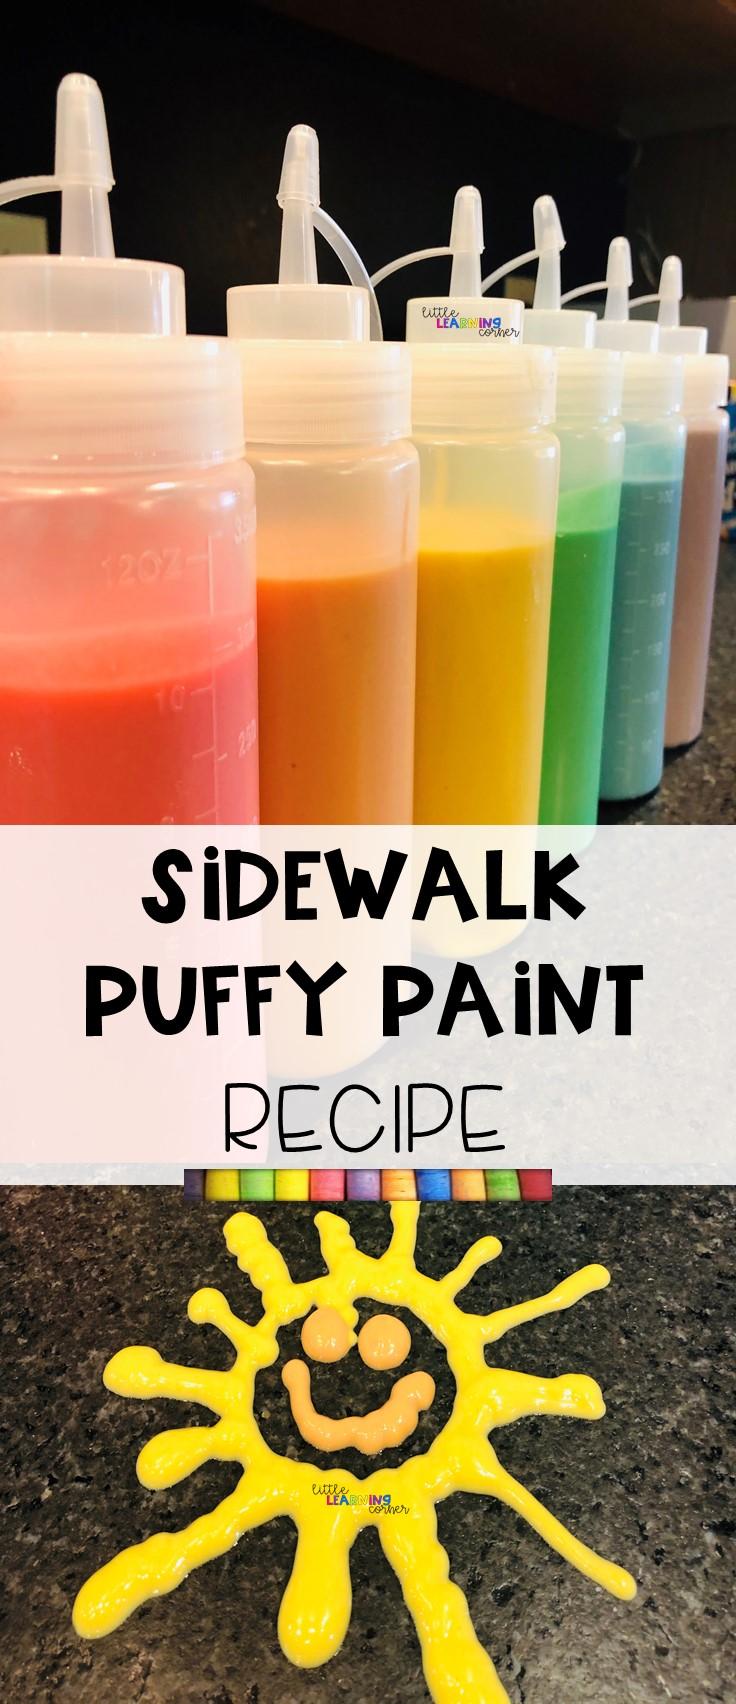 sidewalk-puffy-paint-recipe-summer-craft-pin